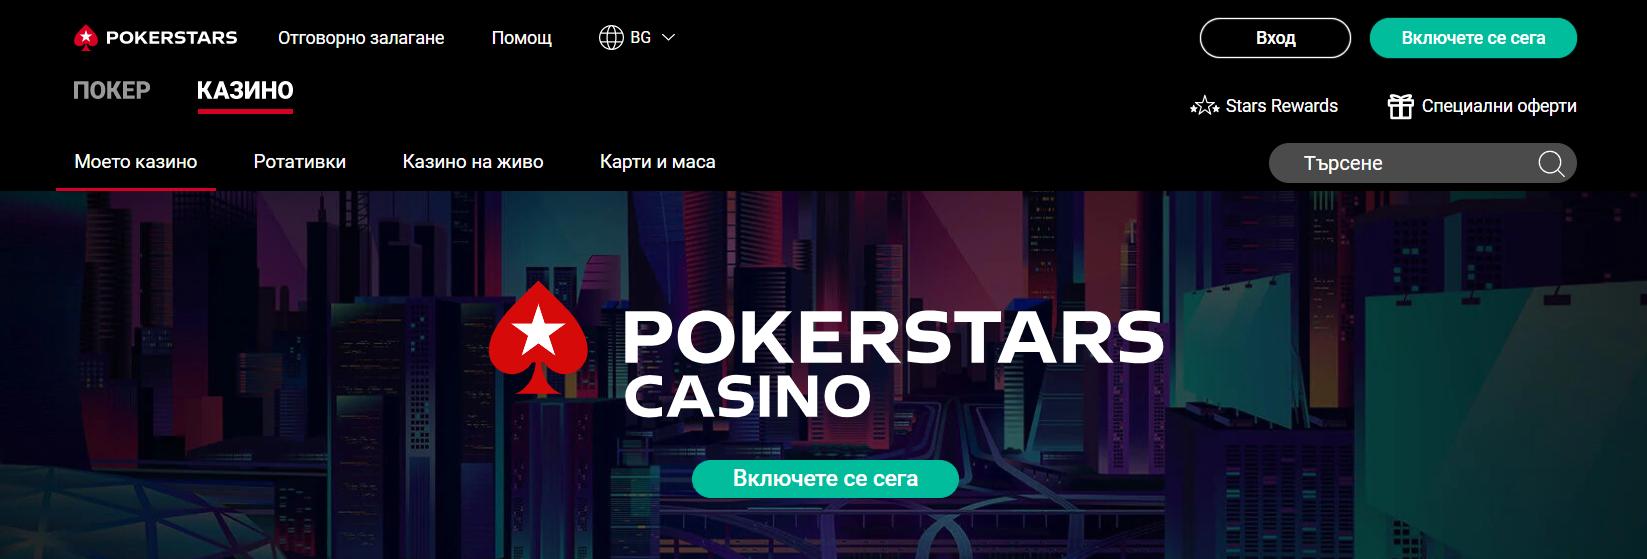 pokerstars casino nachalna stranitsa